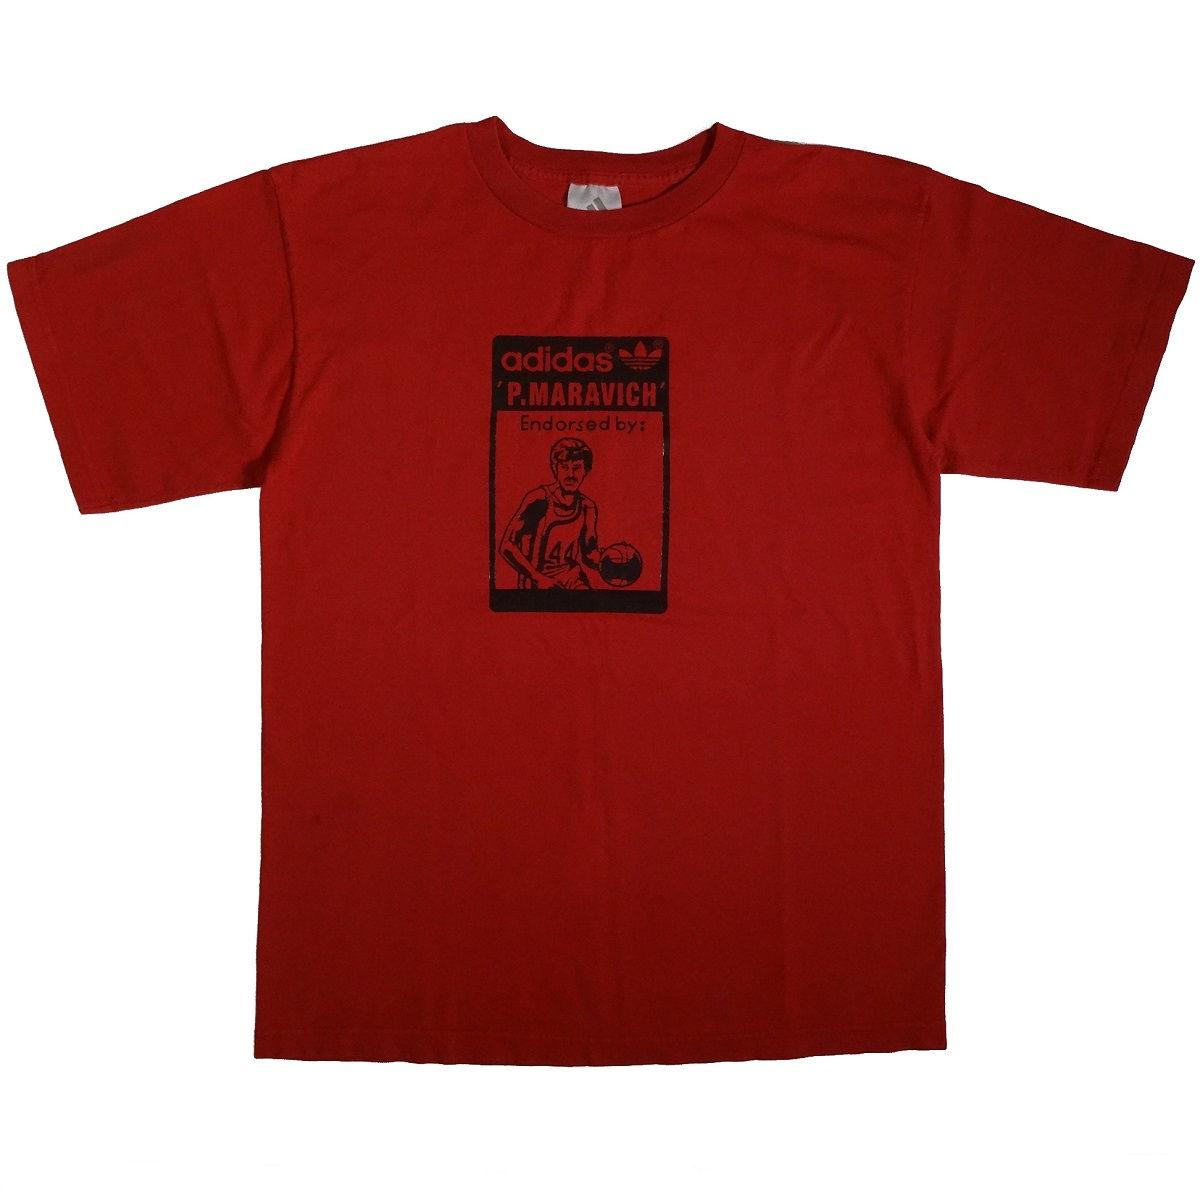 pistol pete maravich vintage adidas shirt front of shirt